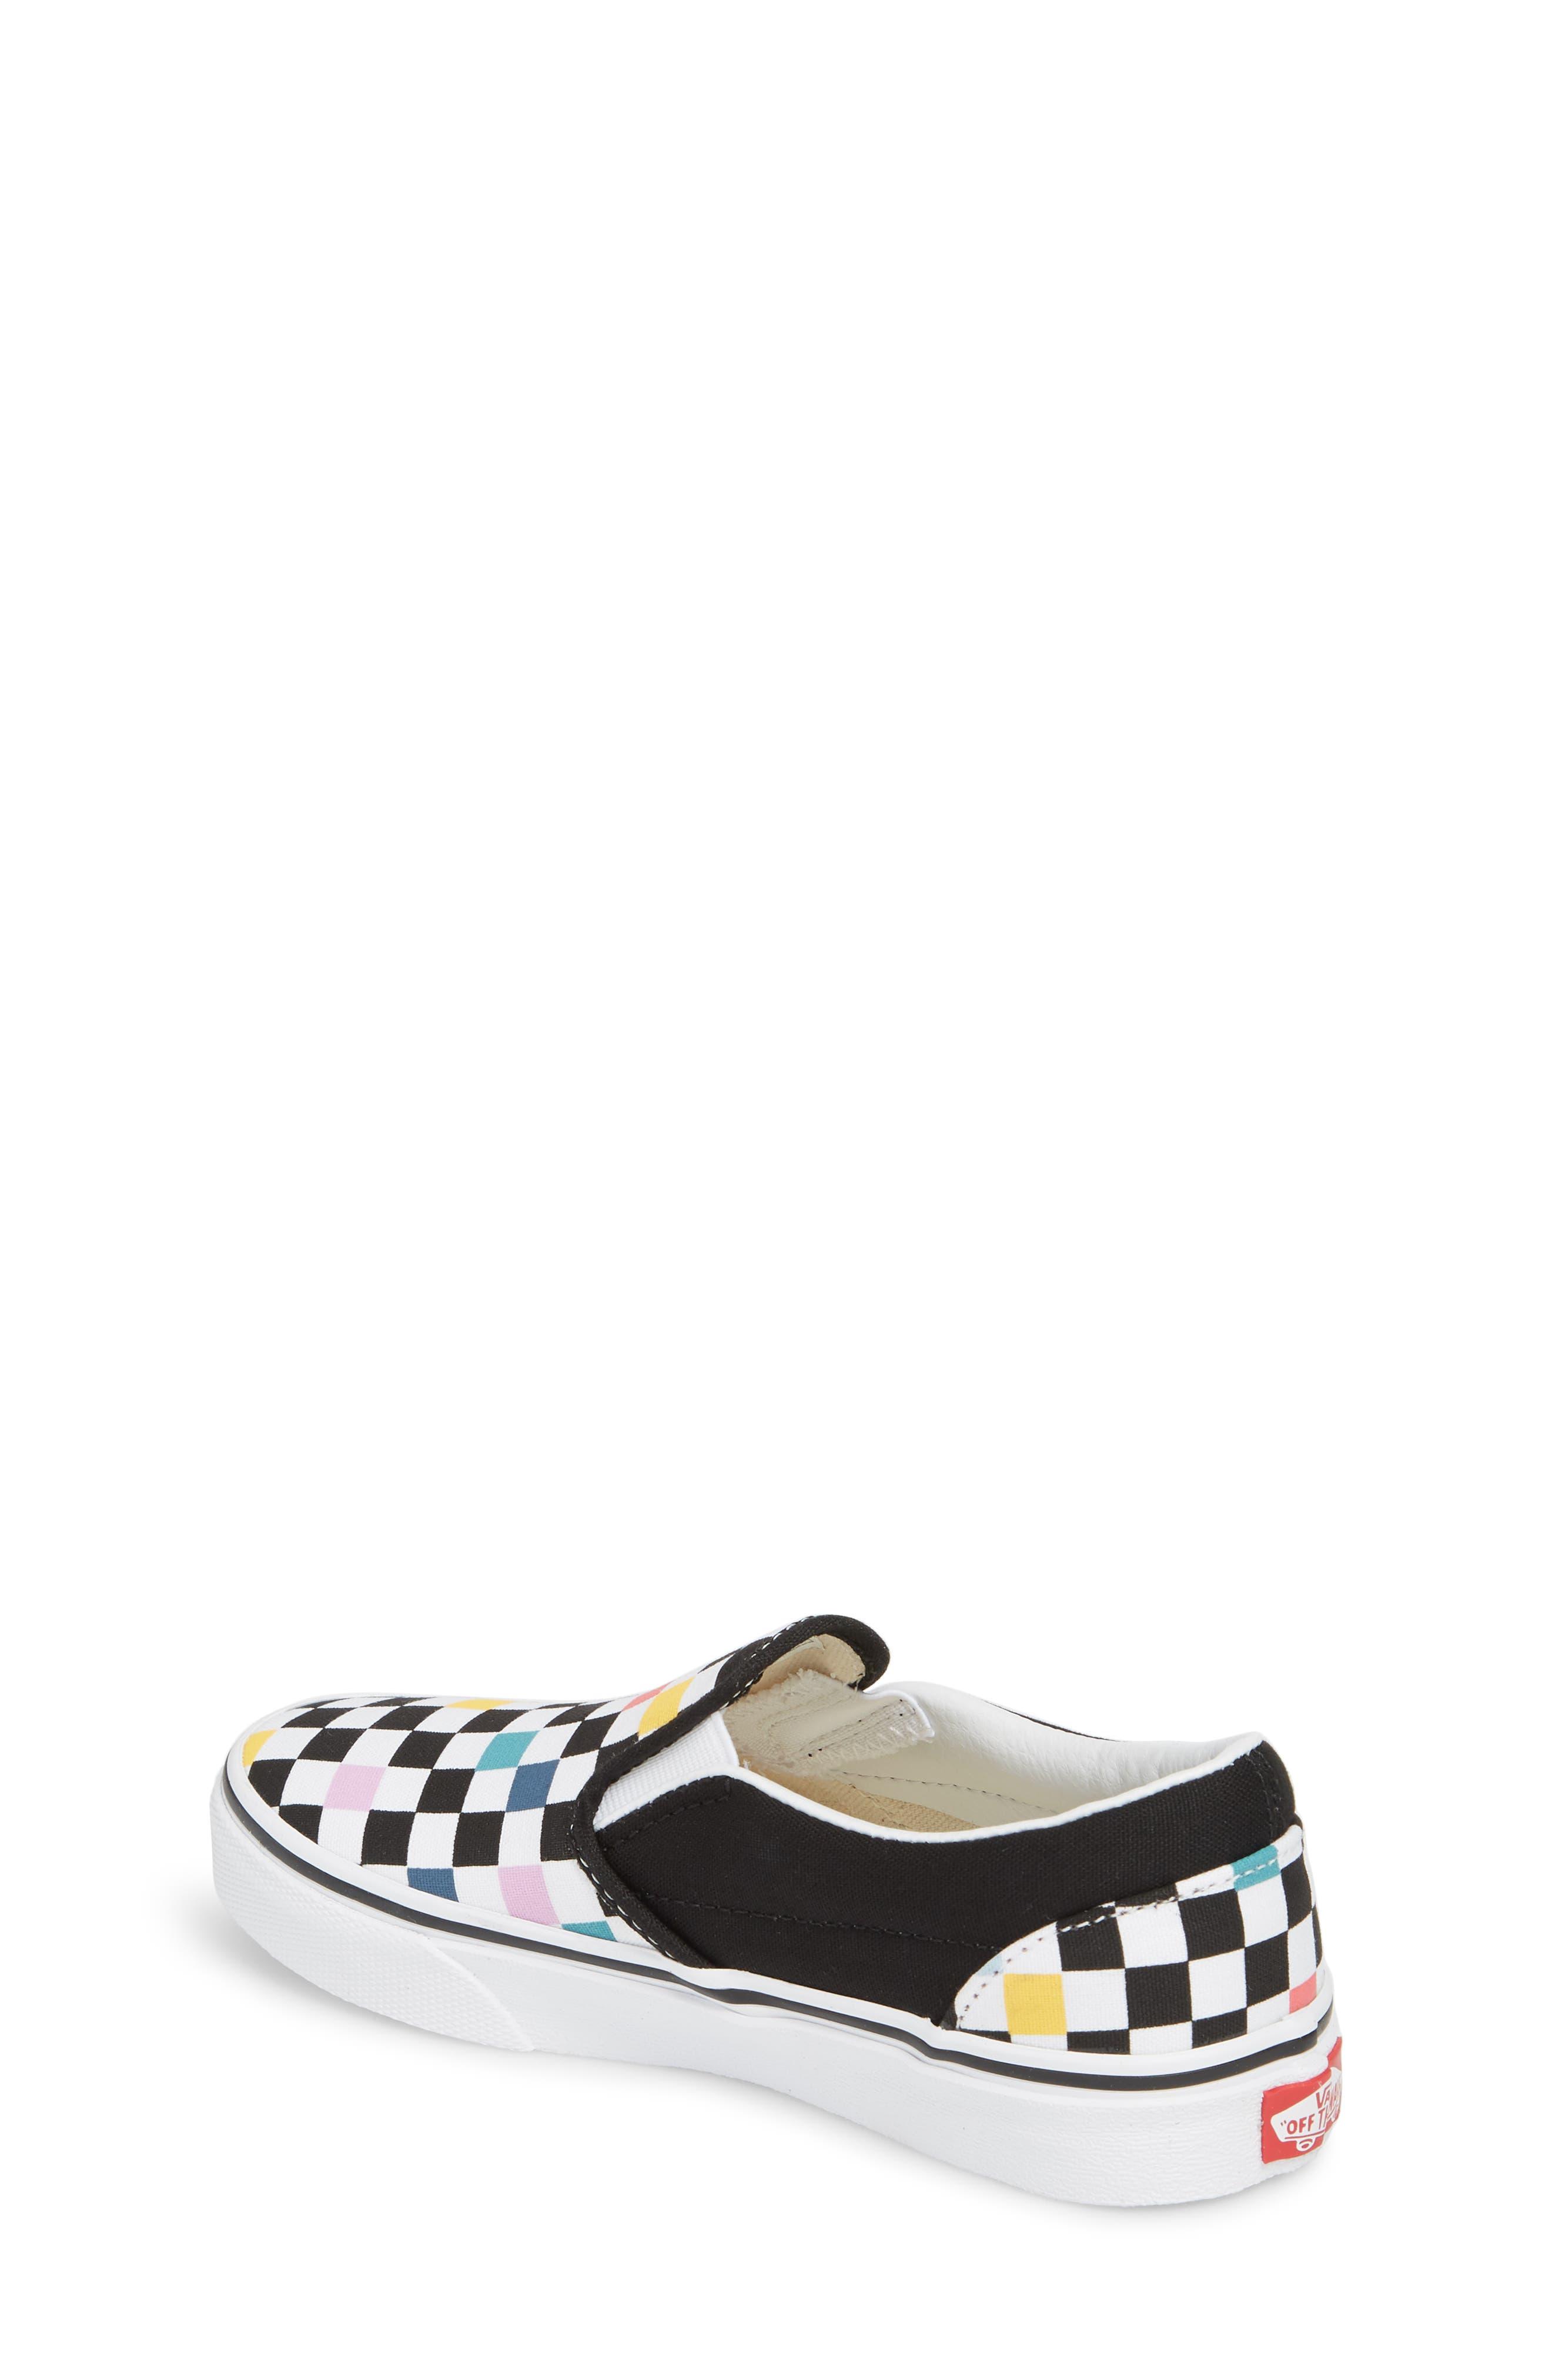 Party Check Slip-On Sneaker,                             Alternate thumbnail 2, color,                             001